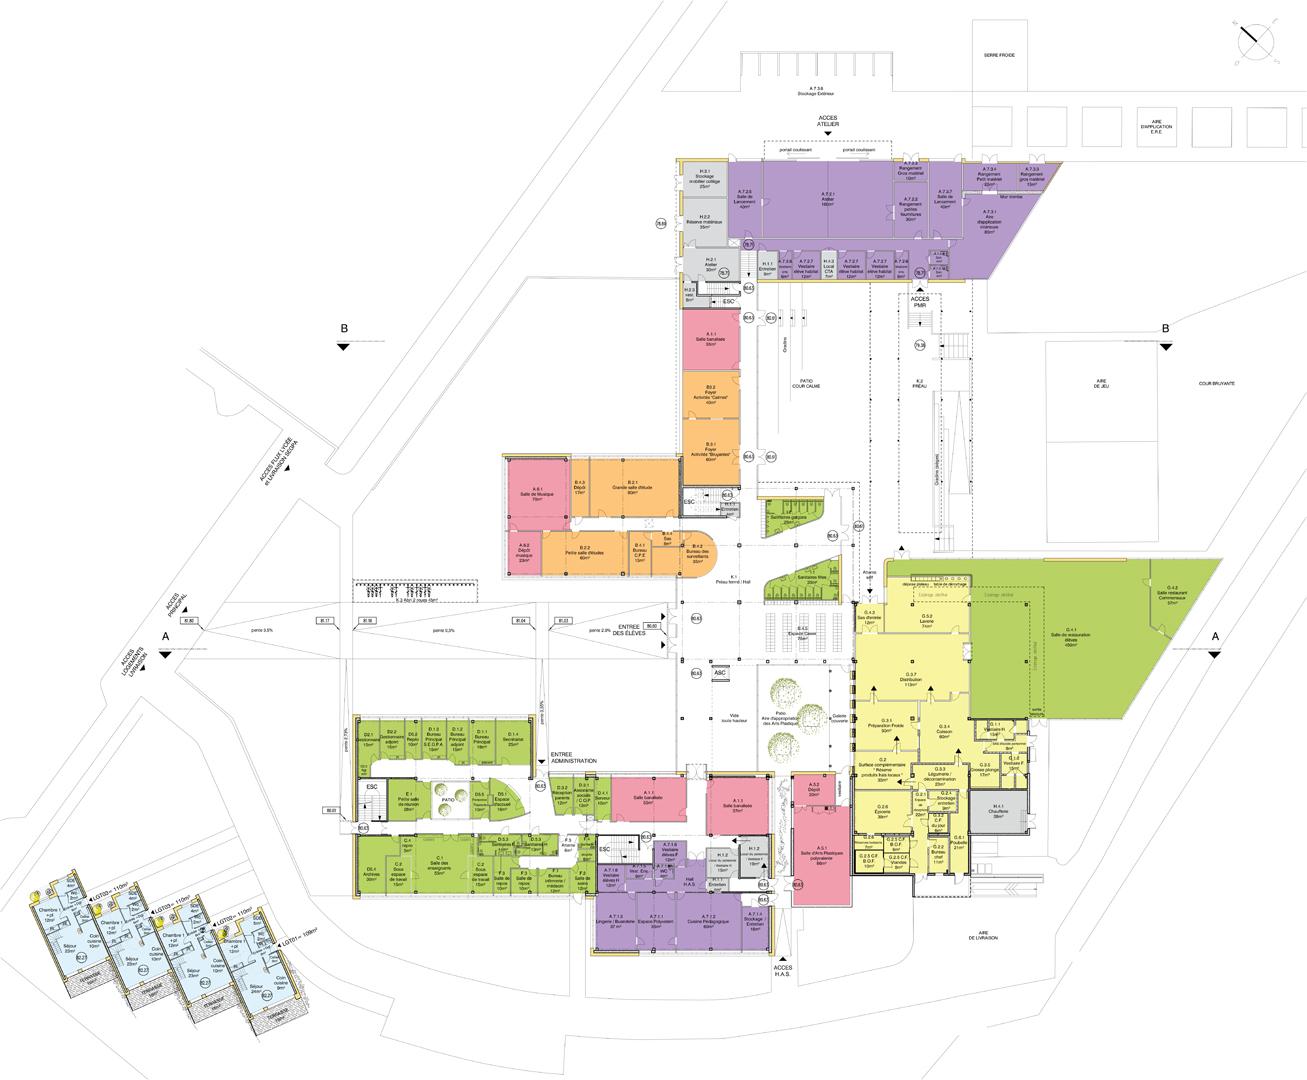 luceau_college_restructuration_bois_passif_7